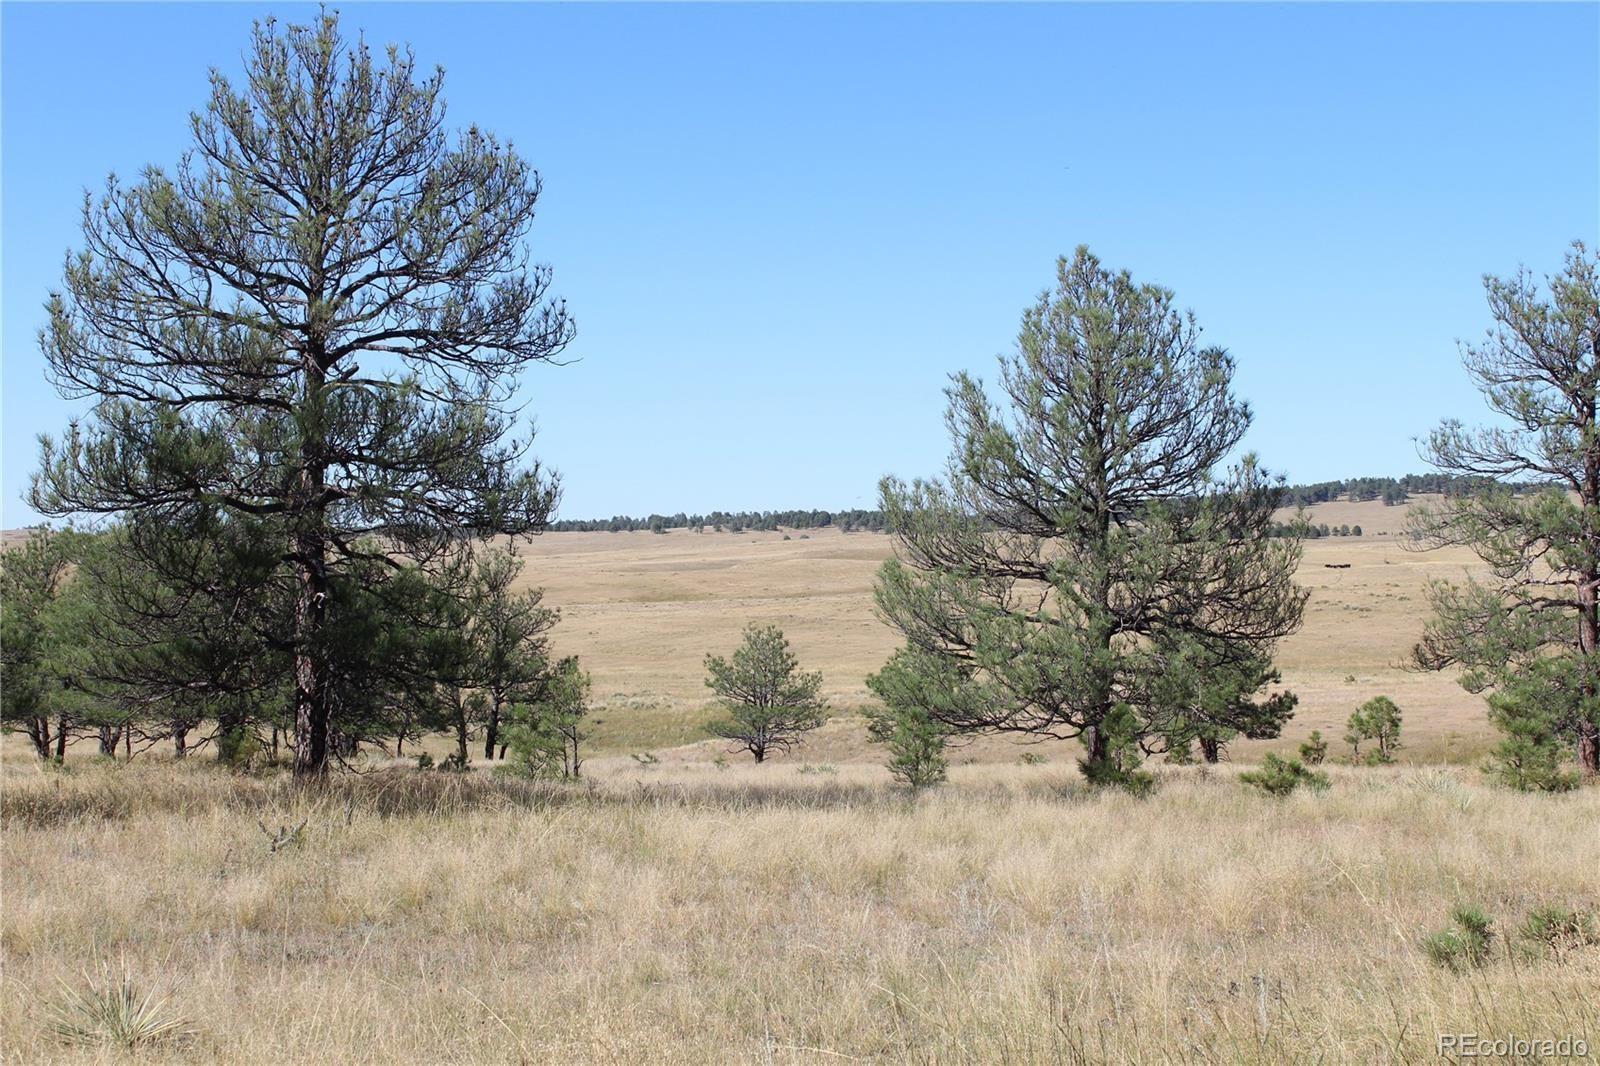 MLS# 2877174 - 8 - Cattle Circle, Kiowa, CO 80117